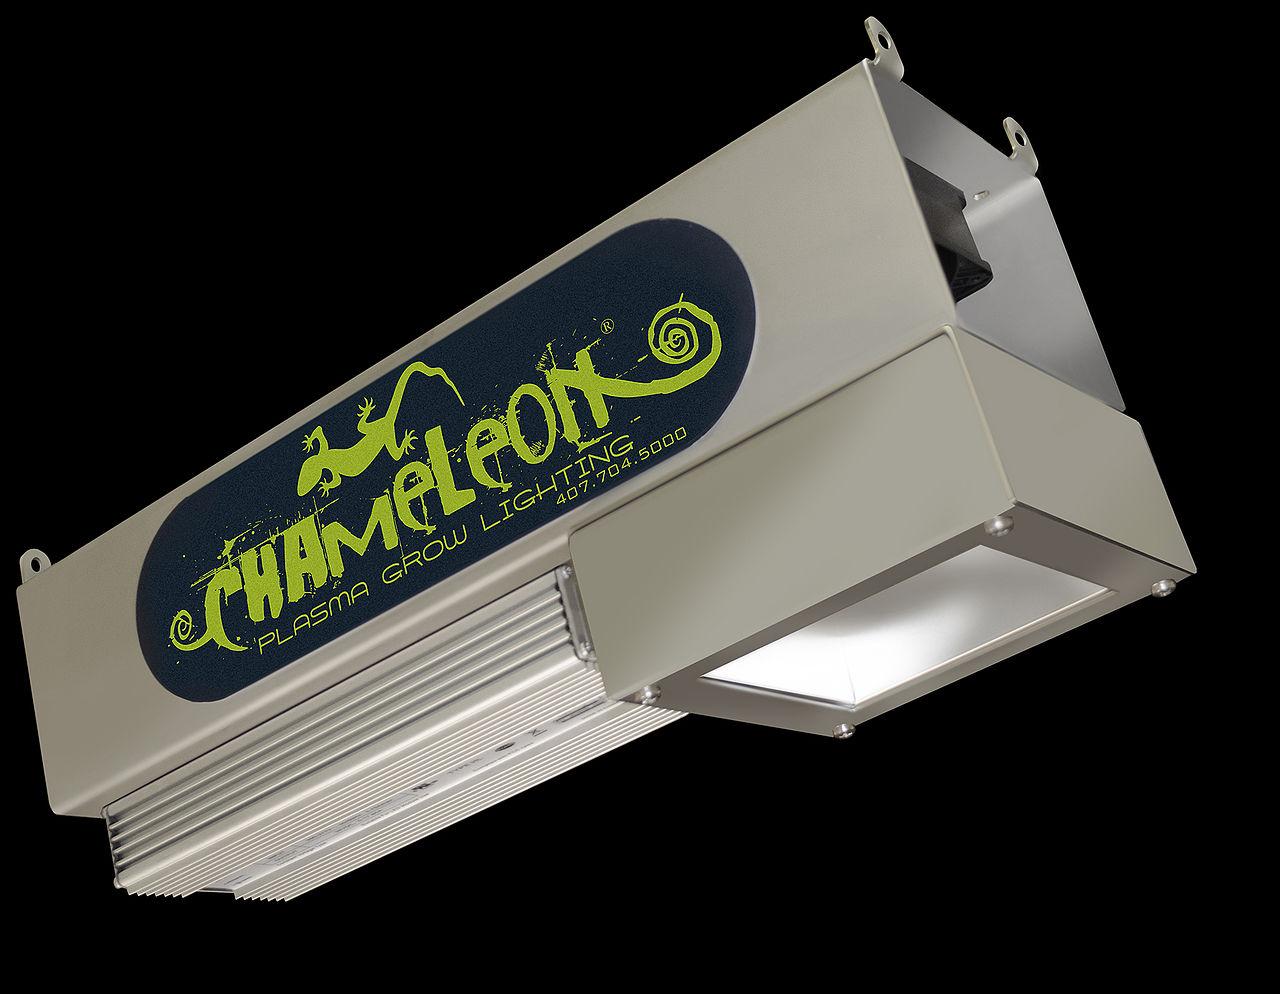 File:500w Chameleon Plasma Grow Light.jpg - Wikimedia Commons for Plasma Grow Light  29jwn